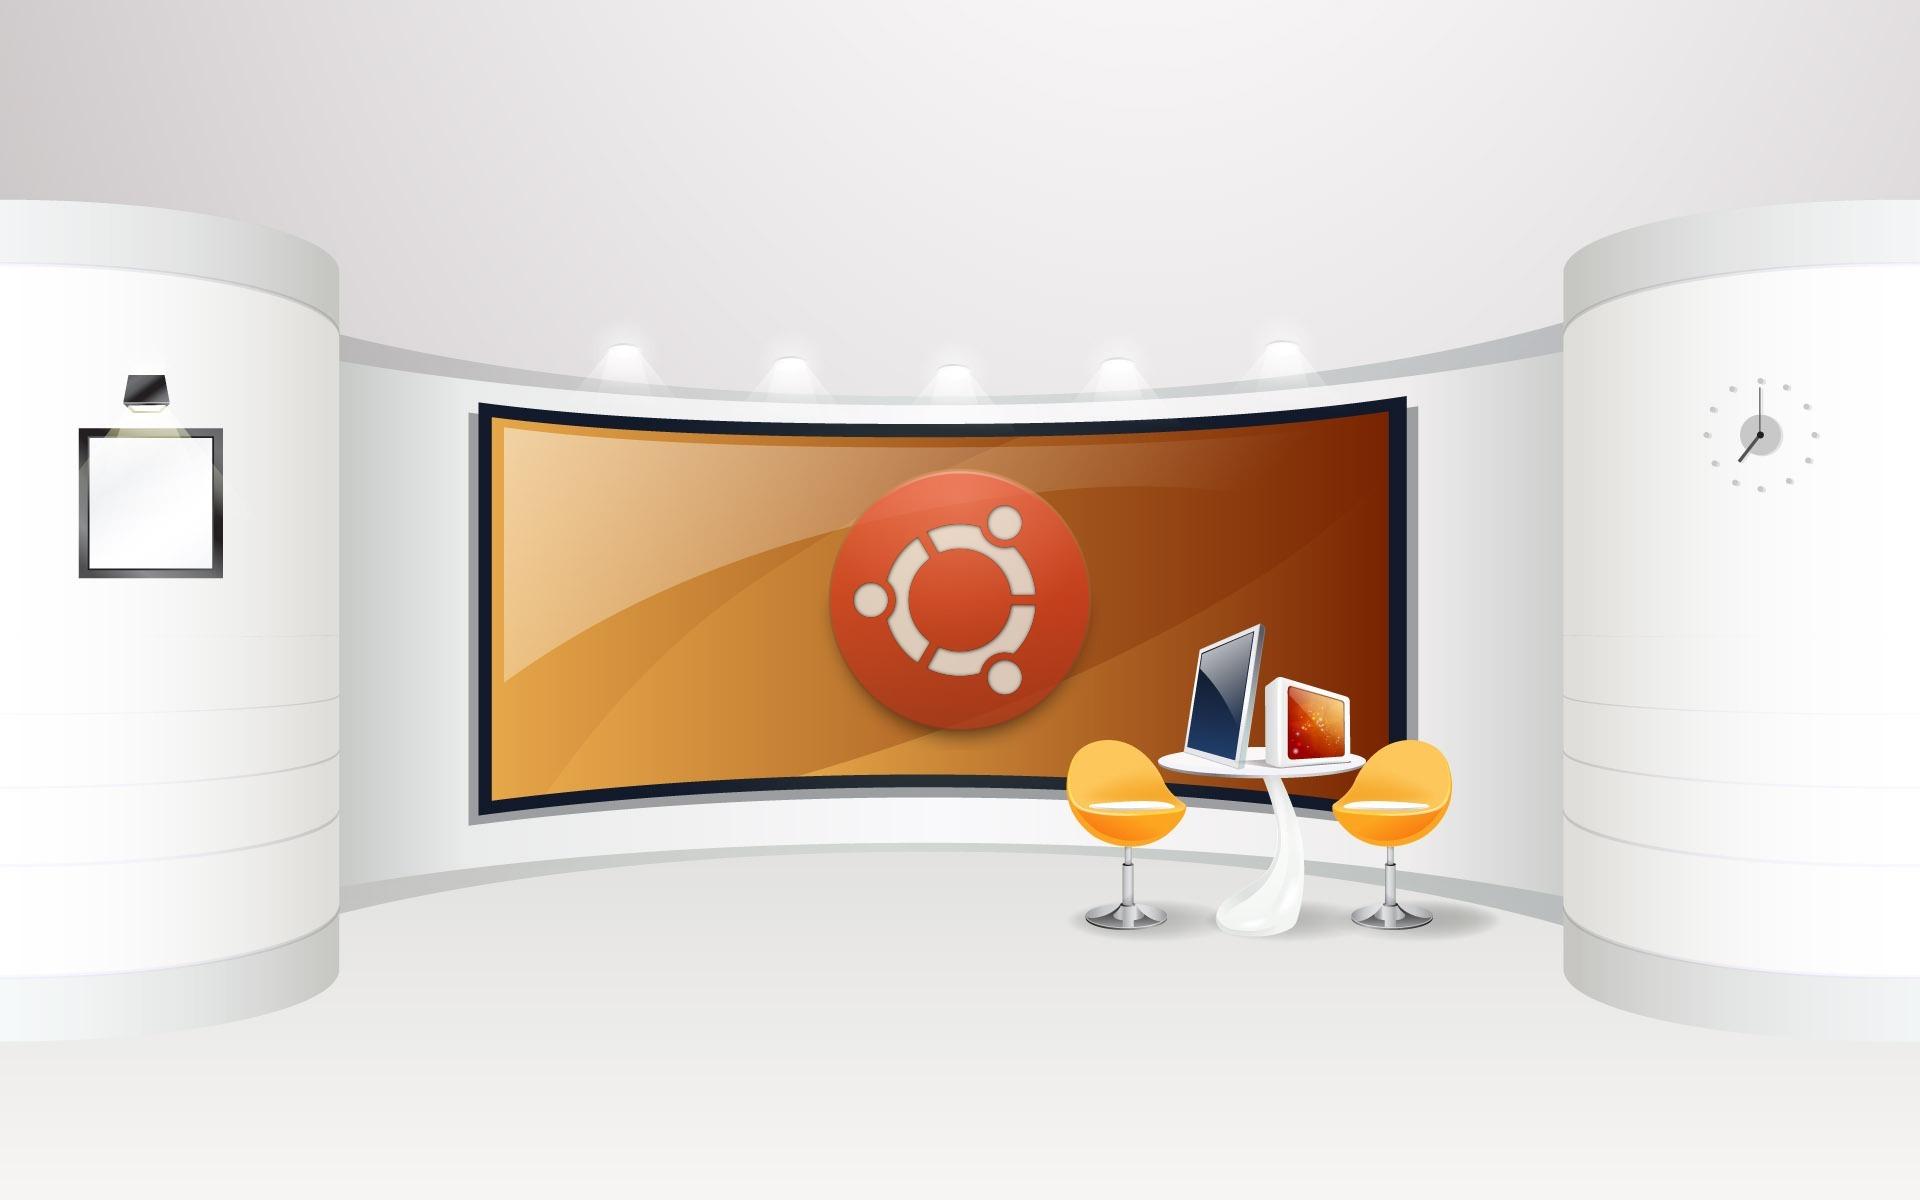 Ubuntu wallpaper home theater zon saja - Home theater wallpaper ...